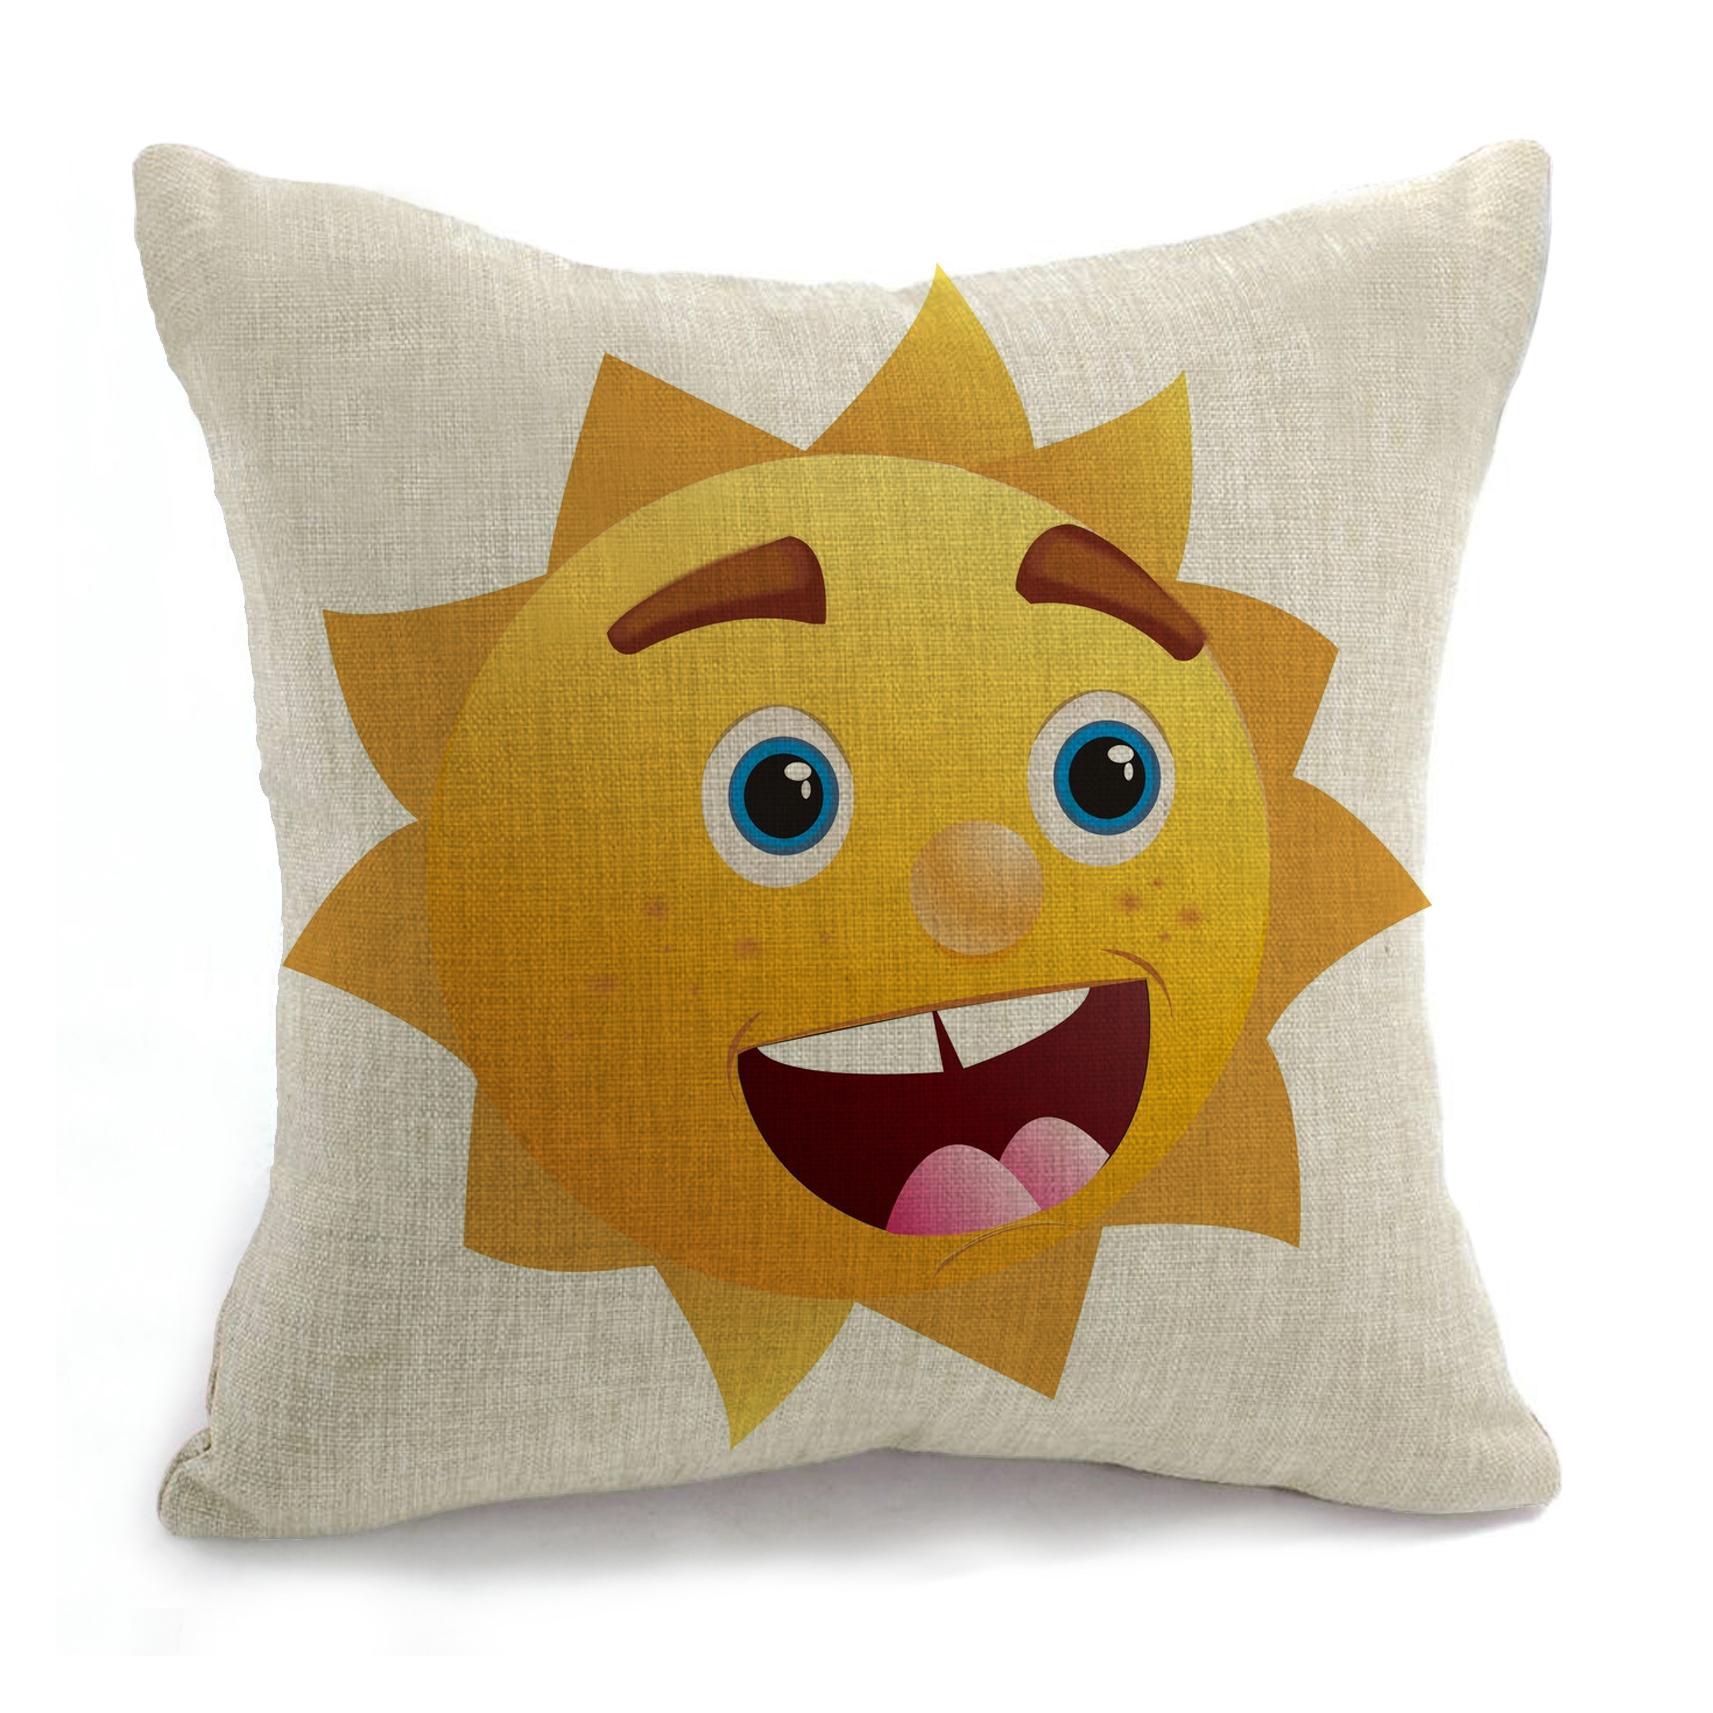 Scandinavian Pouf Decorativos Cojines 18 Inches Smile Decorative Throw Pillow Emoji Kussens Home Decor Cushion Coussin Almofada